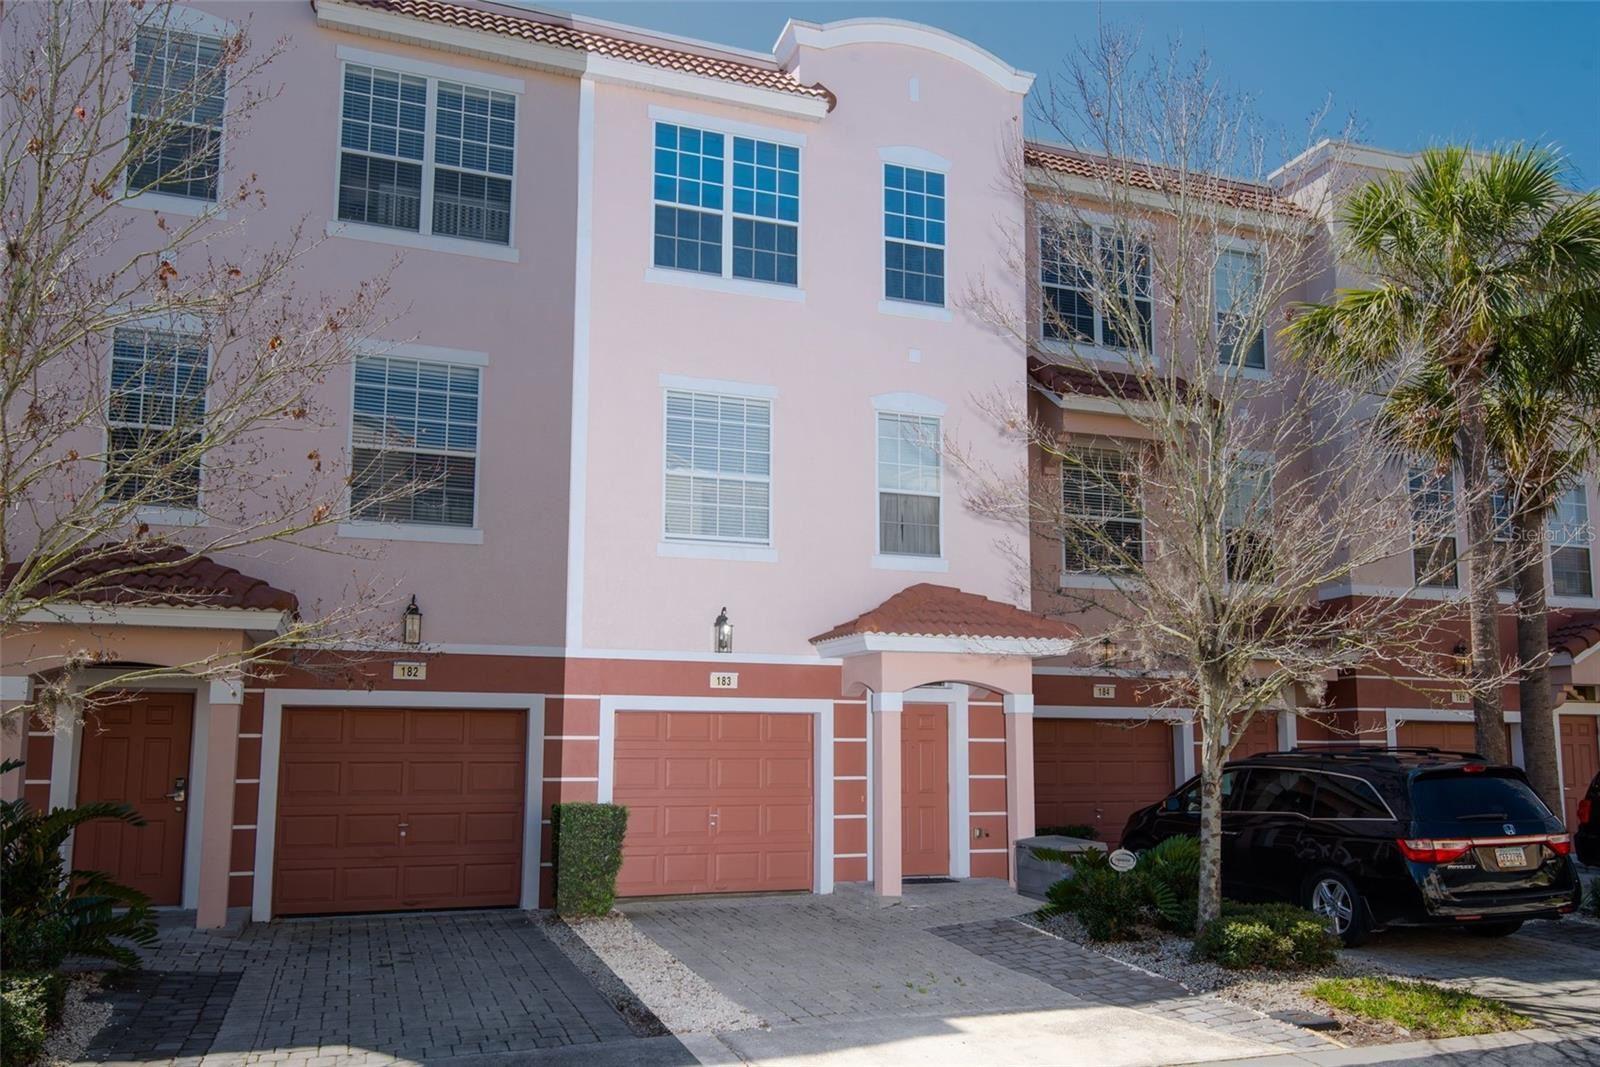 4830 TIDECREST AVENUE #183, Orlando, FL 32819 - #: O5971931